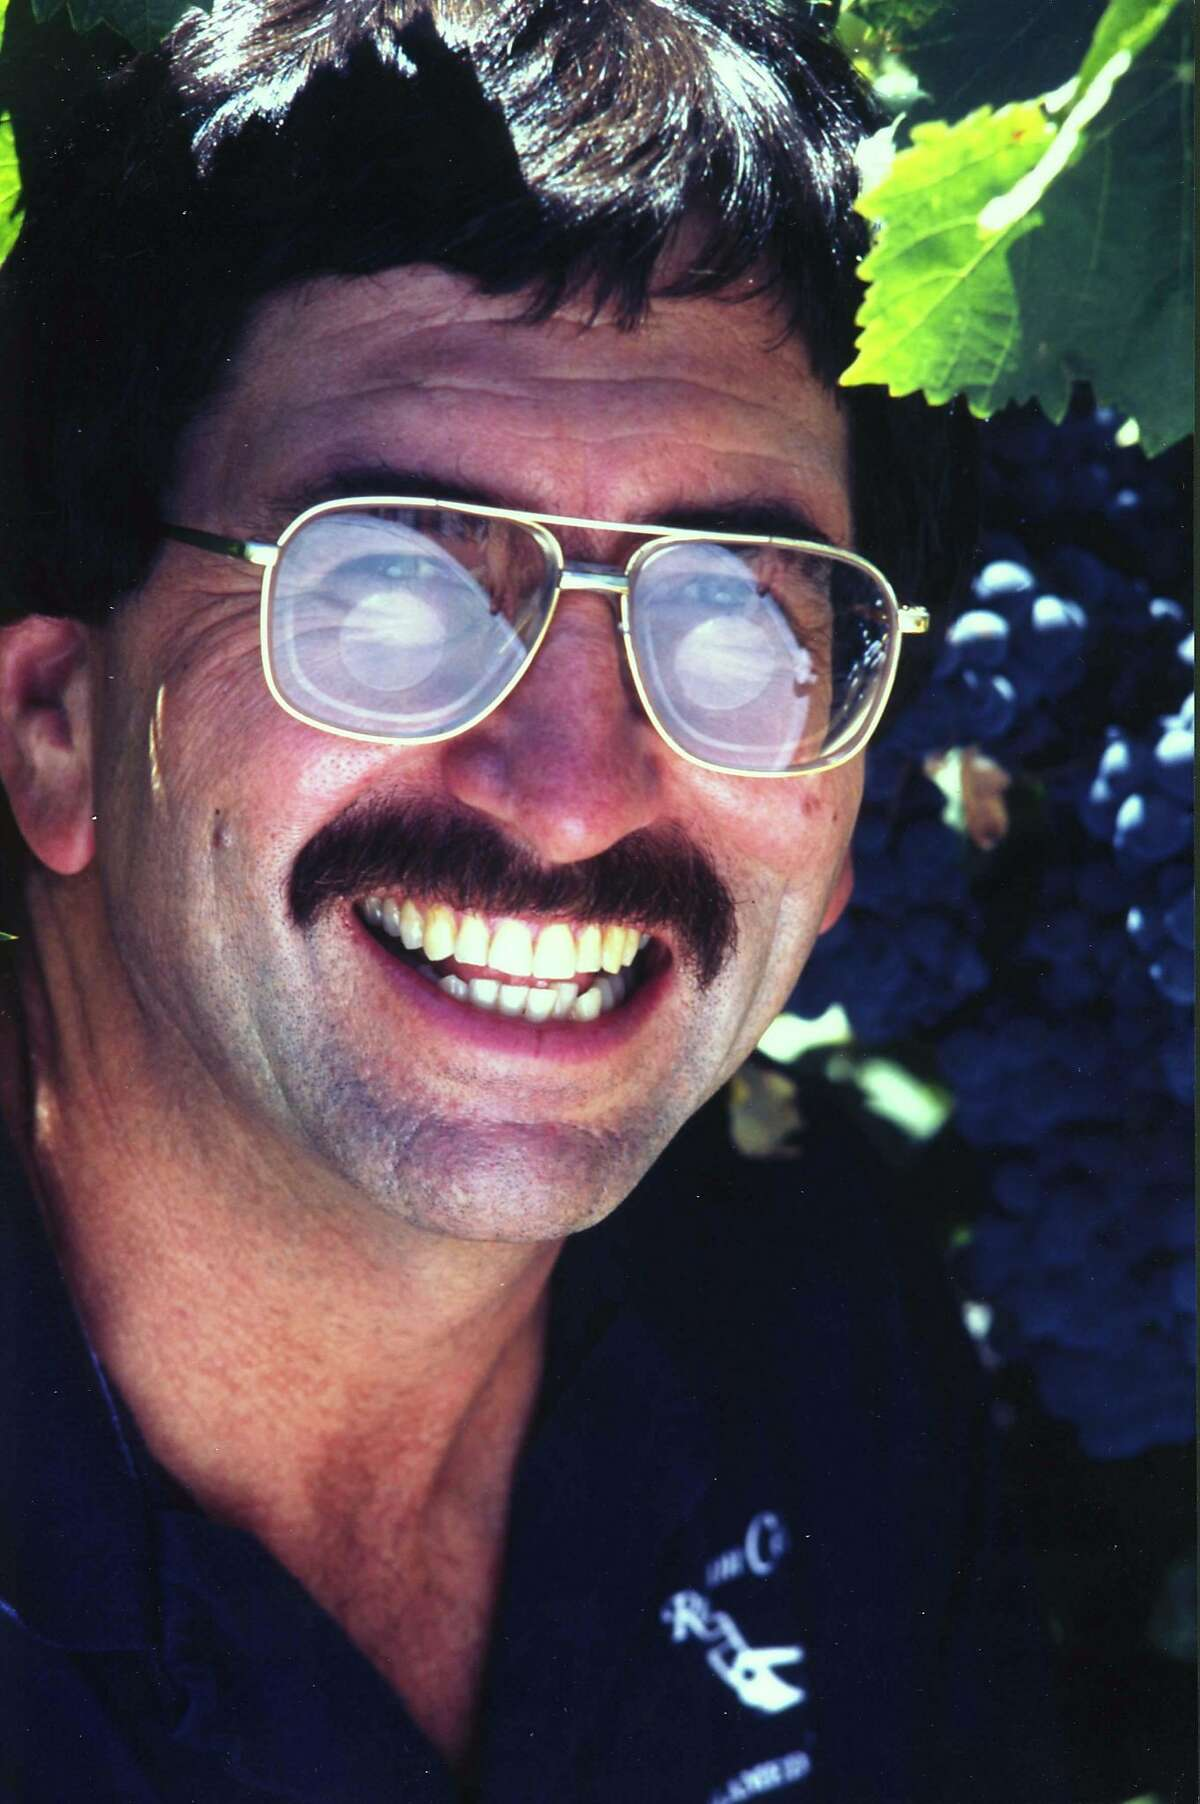 Kent Rosenblum of Rosenblum Cellars winery. HOUCHRON CAPTION (02/26/2003): Rosenblum. WINE.